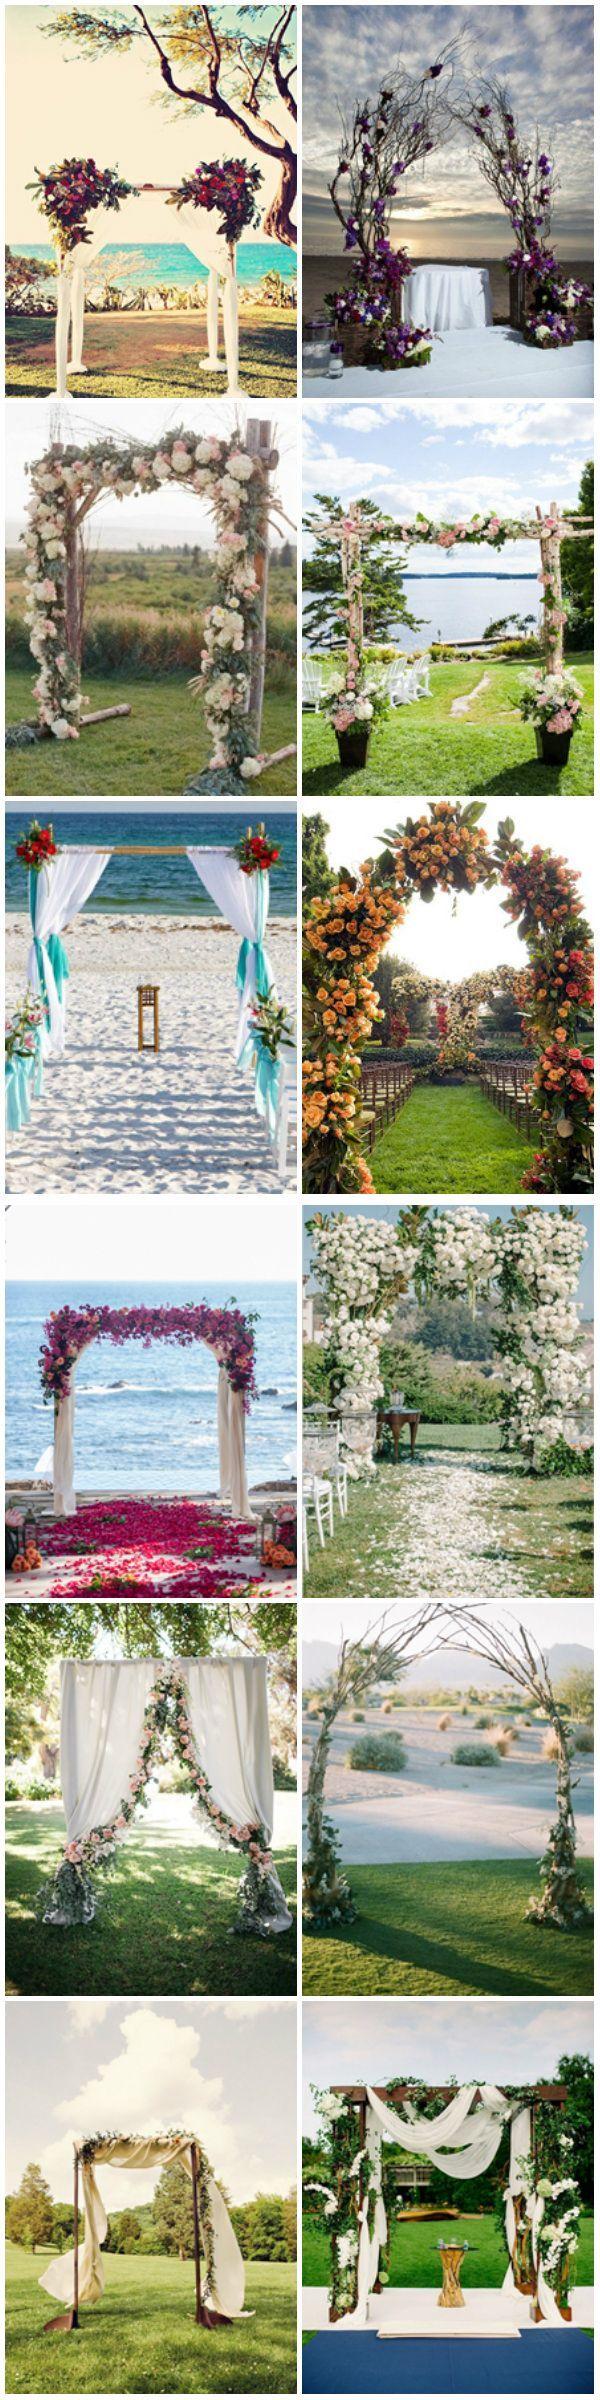 Wedding decorations in nigeria november 2018  best DIY Wedding images on Pinterest  Marriage Wedding